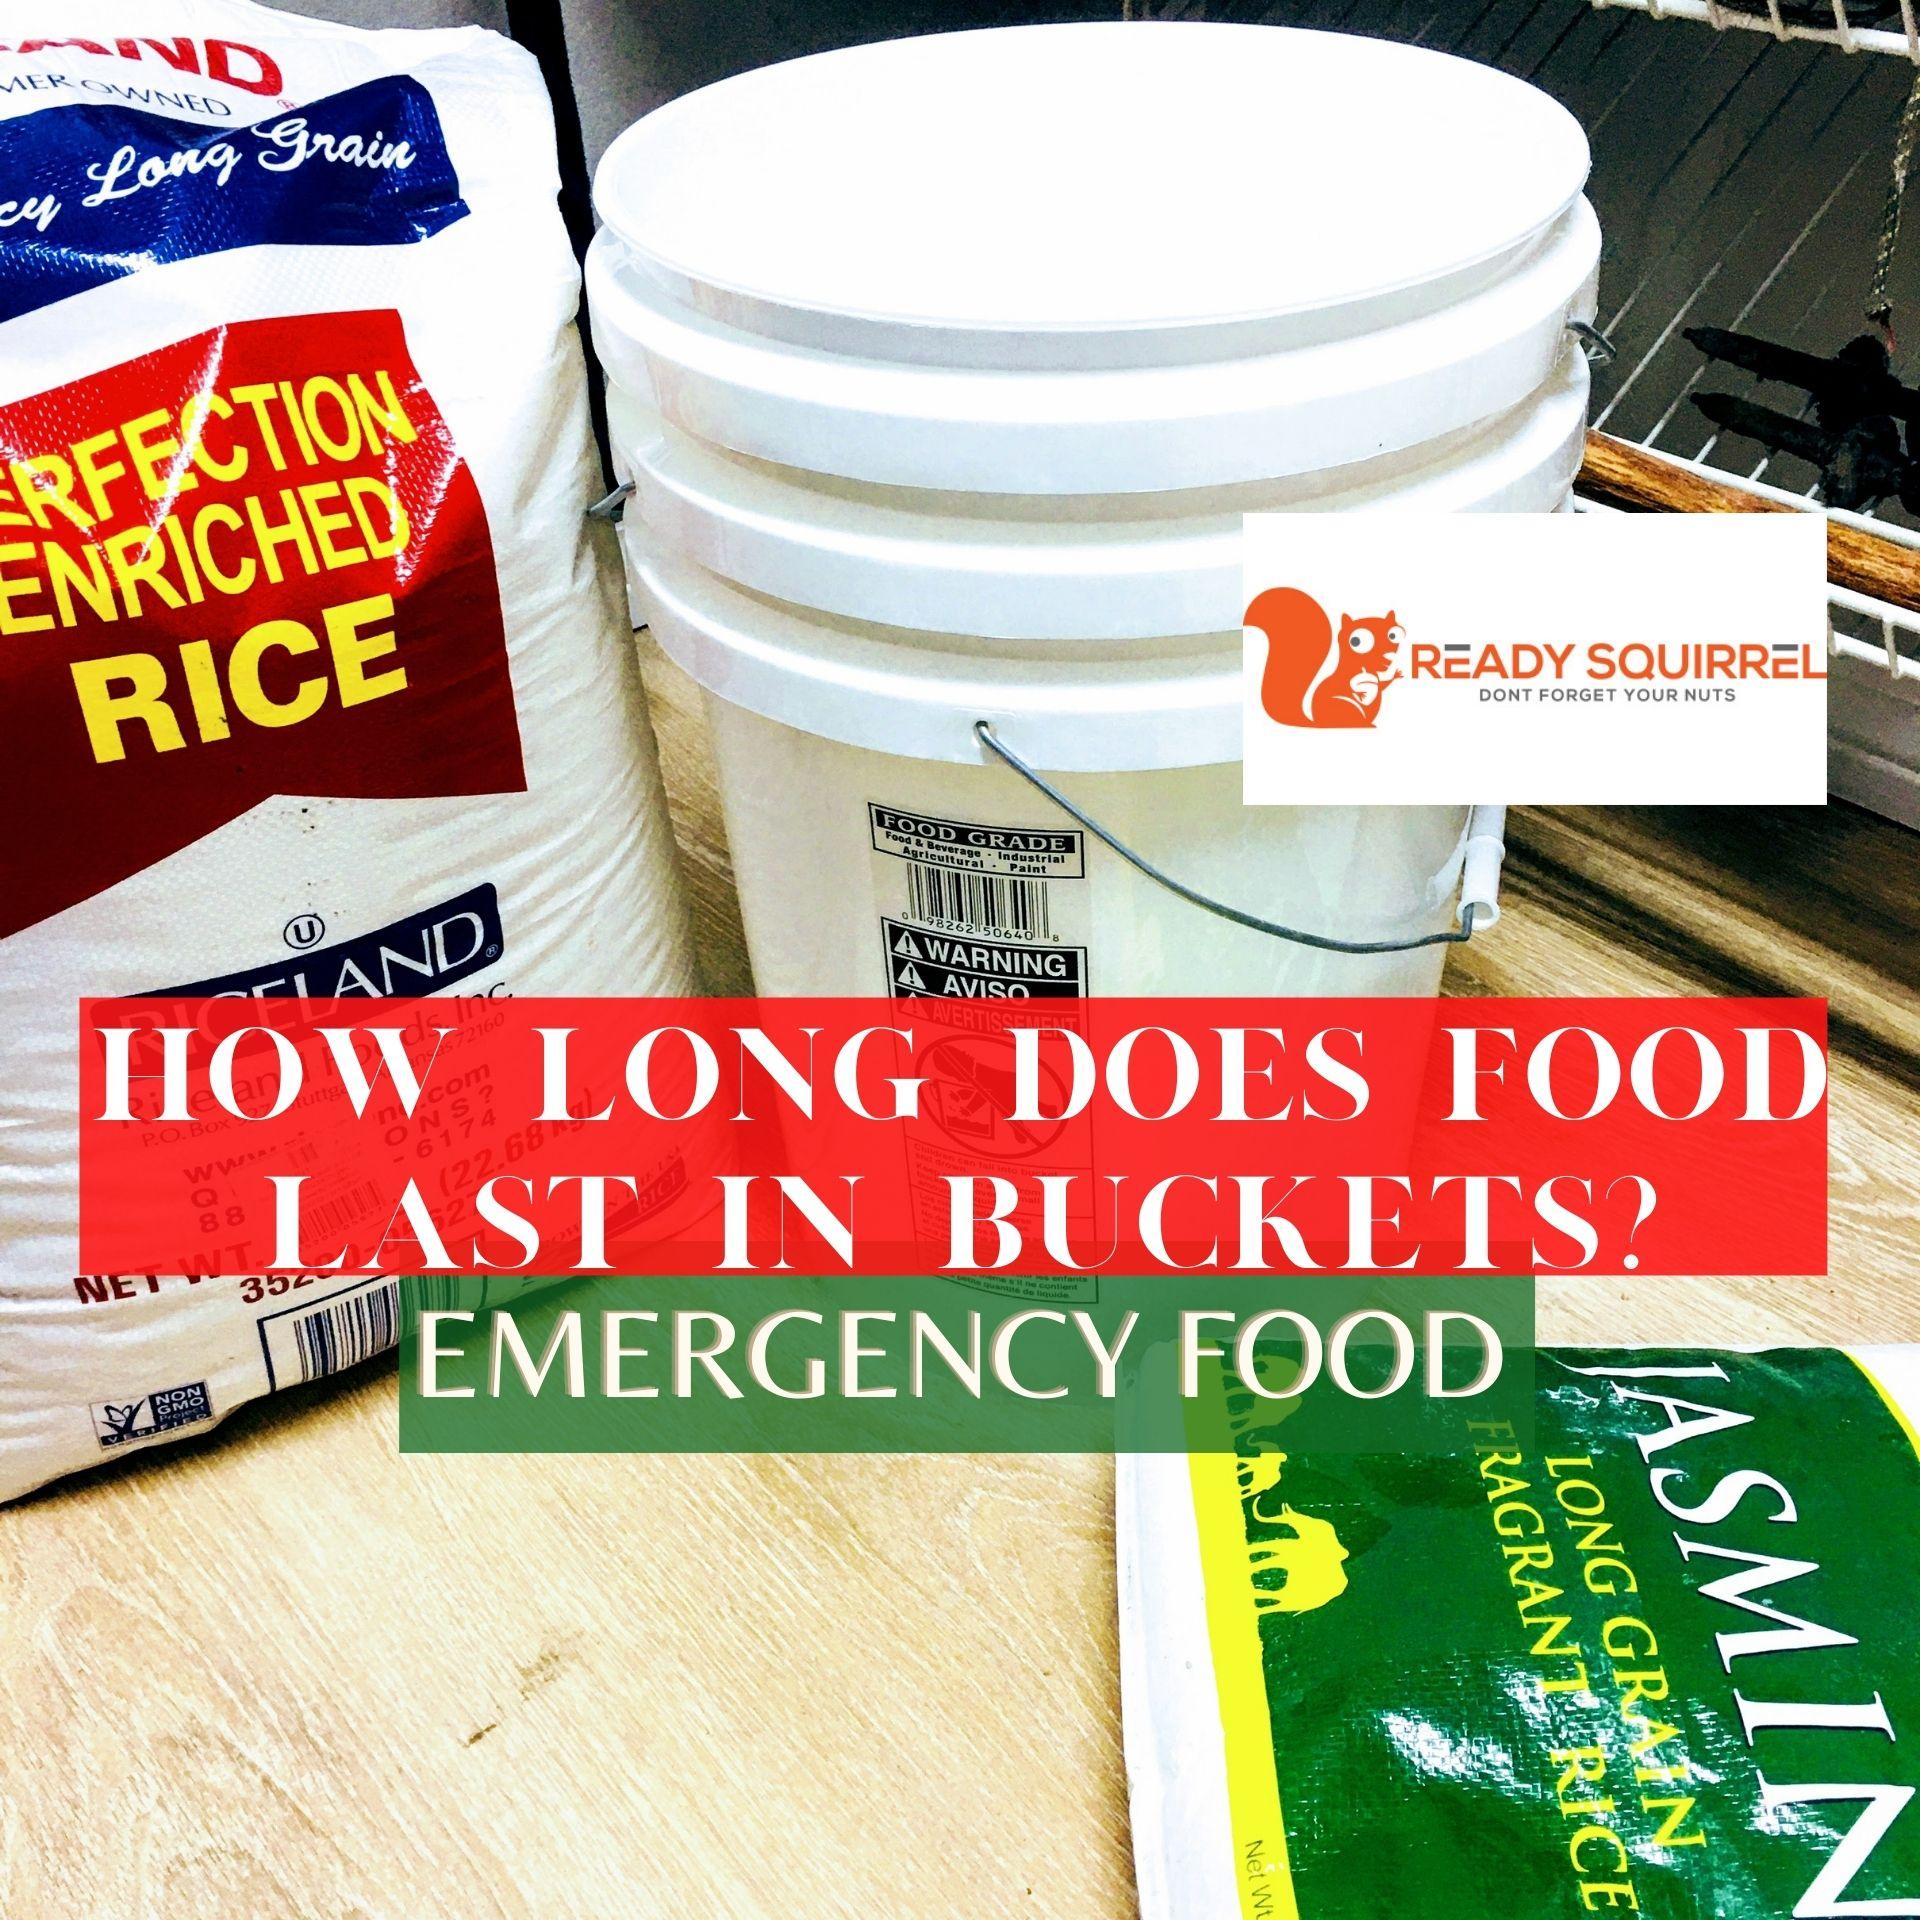 How Long Does Food Last in Food-grade Buckets?